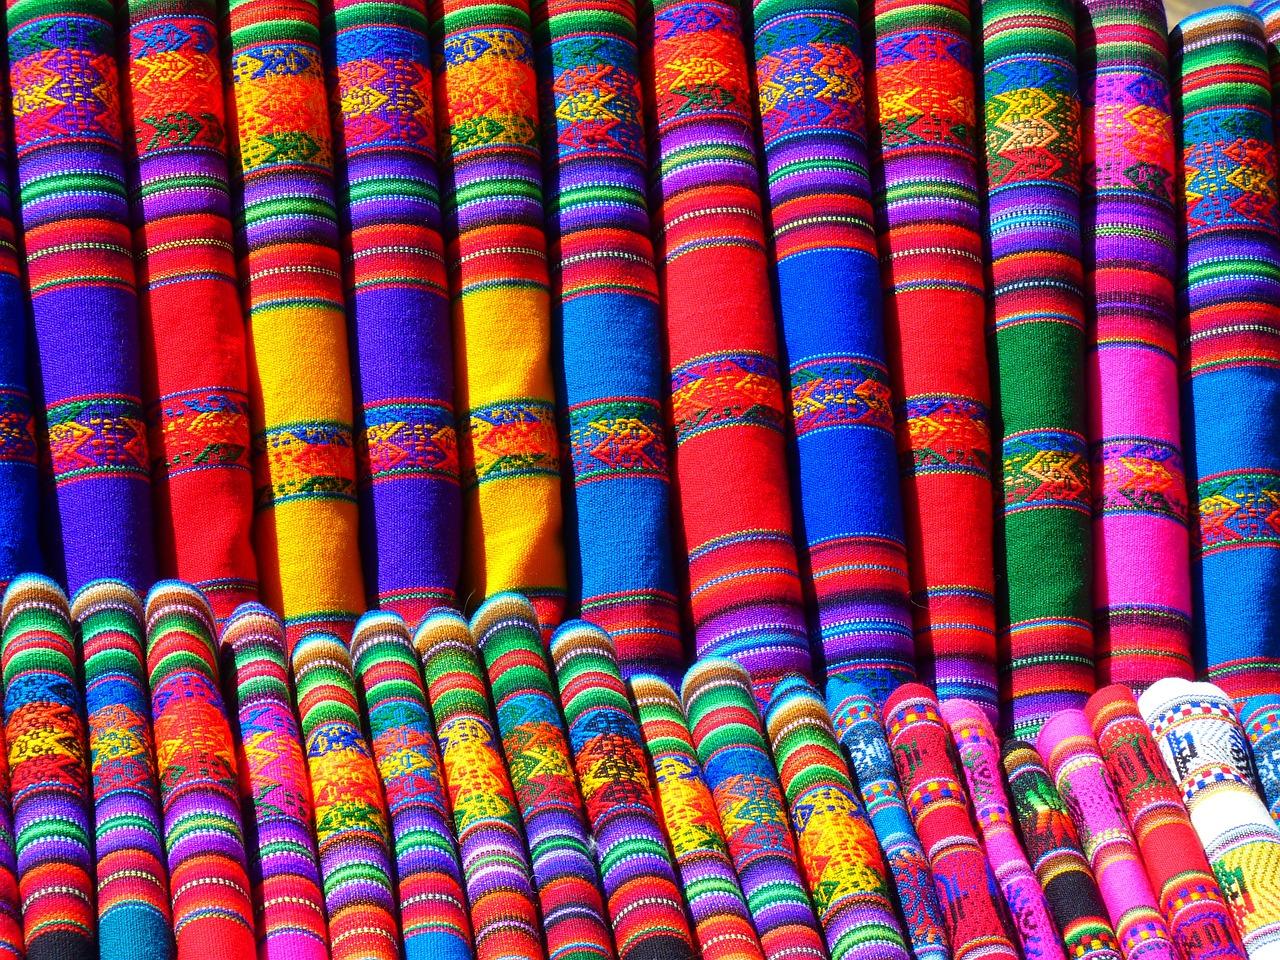 color, color pickers, color matching, logo color, color combinations